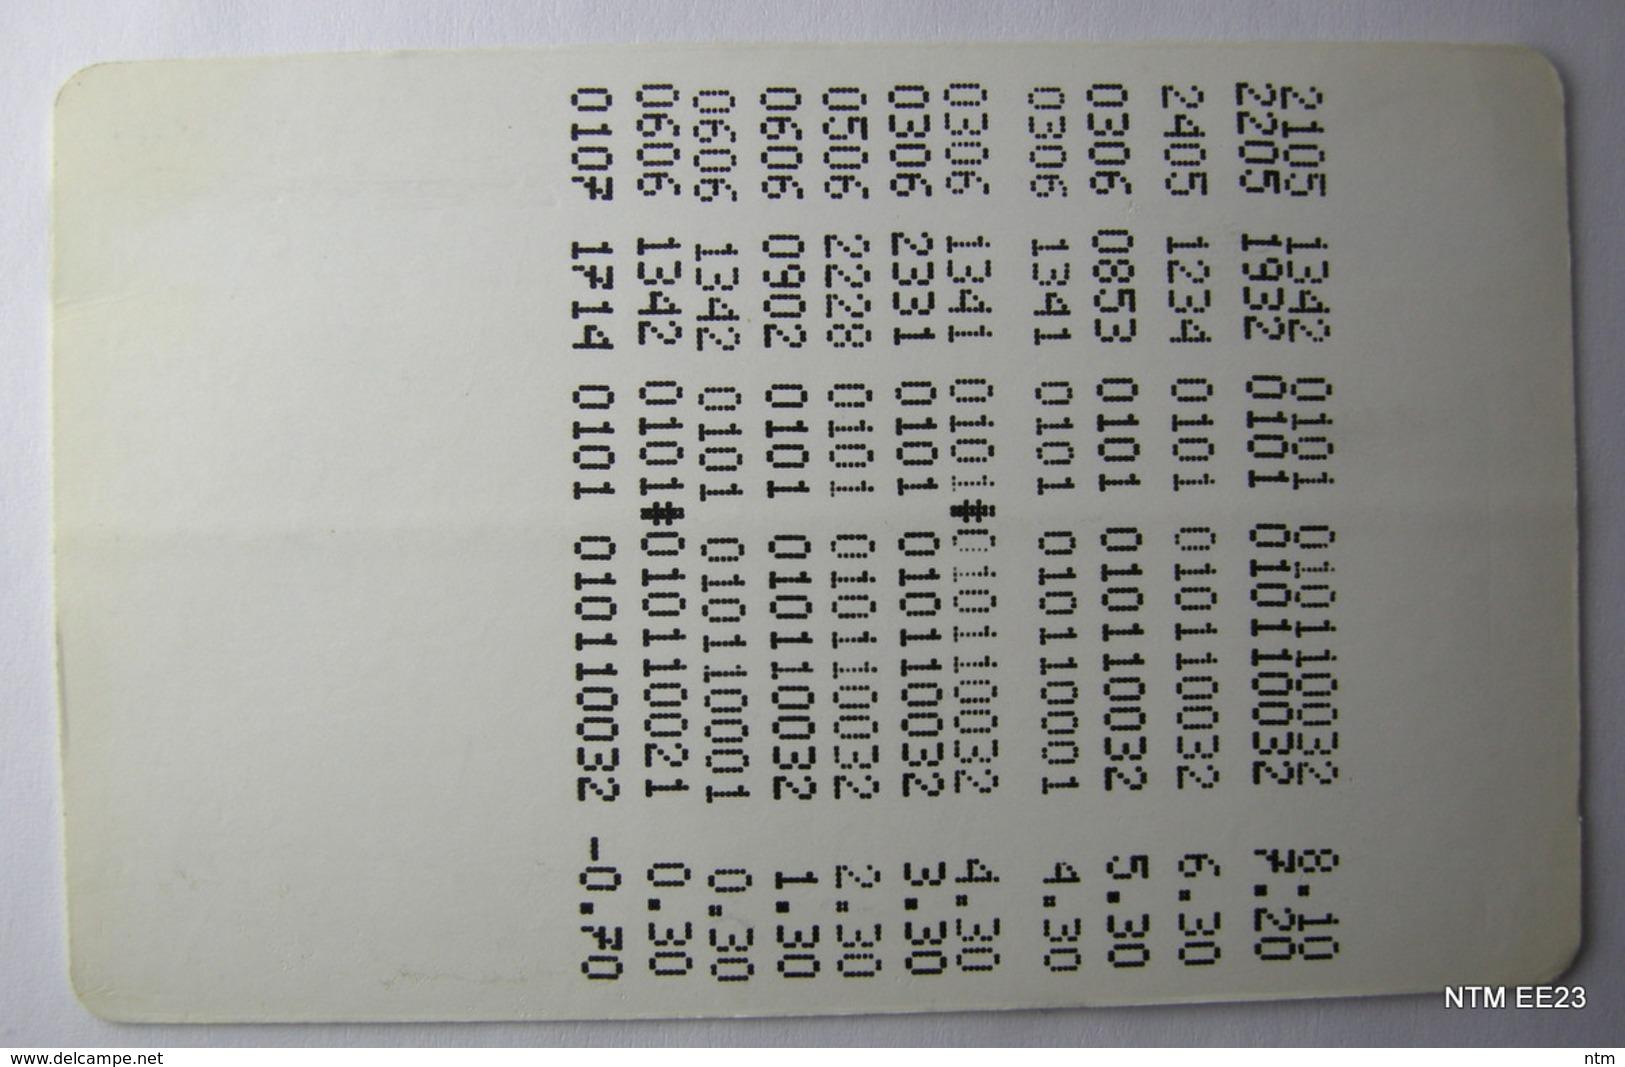 BELGIUM DeLijn Bus Cards X 4 (Used). - Transportation Tickets